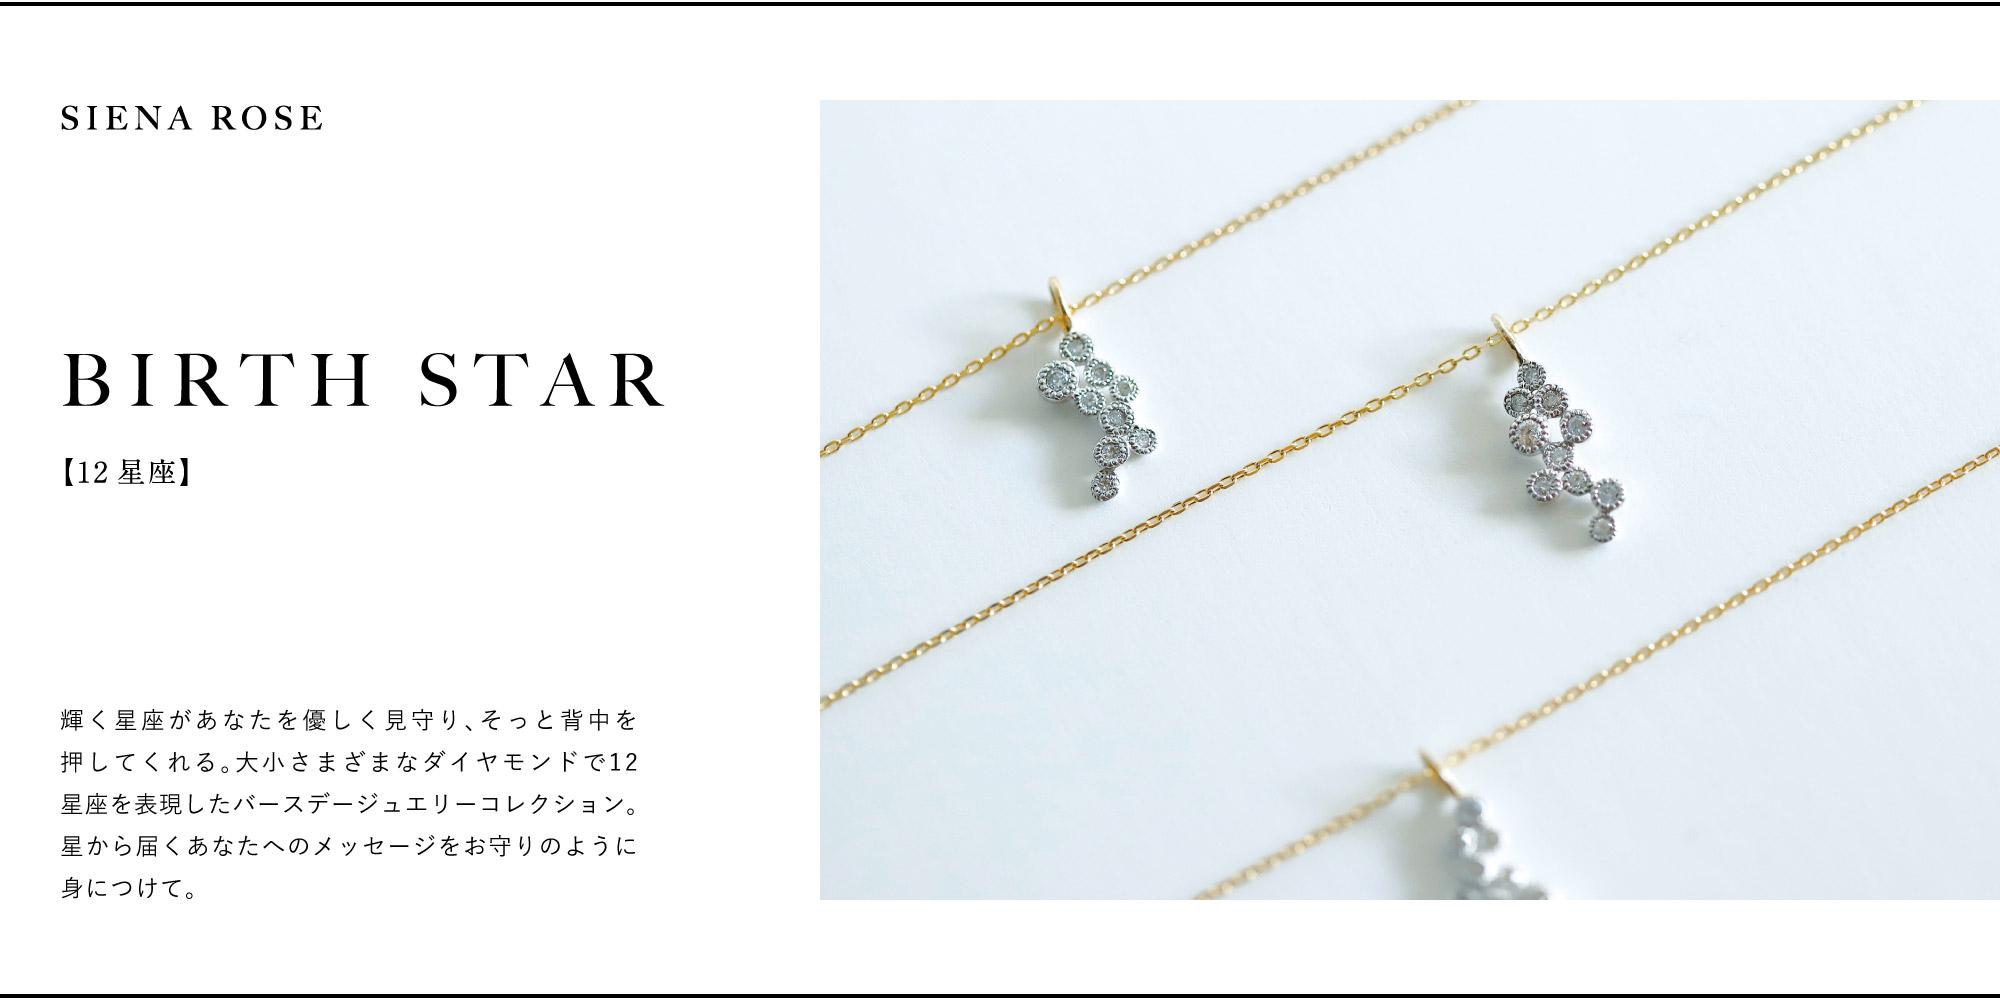 BIRTH STAR(バーススター)